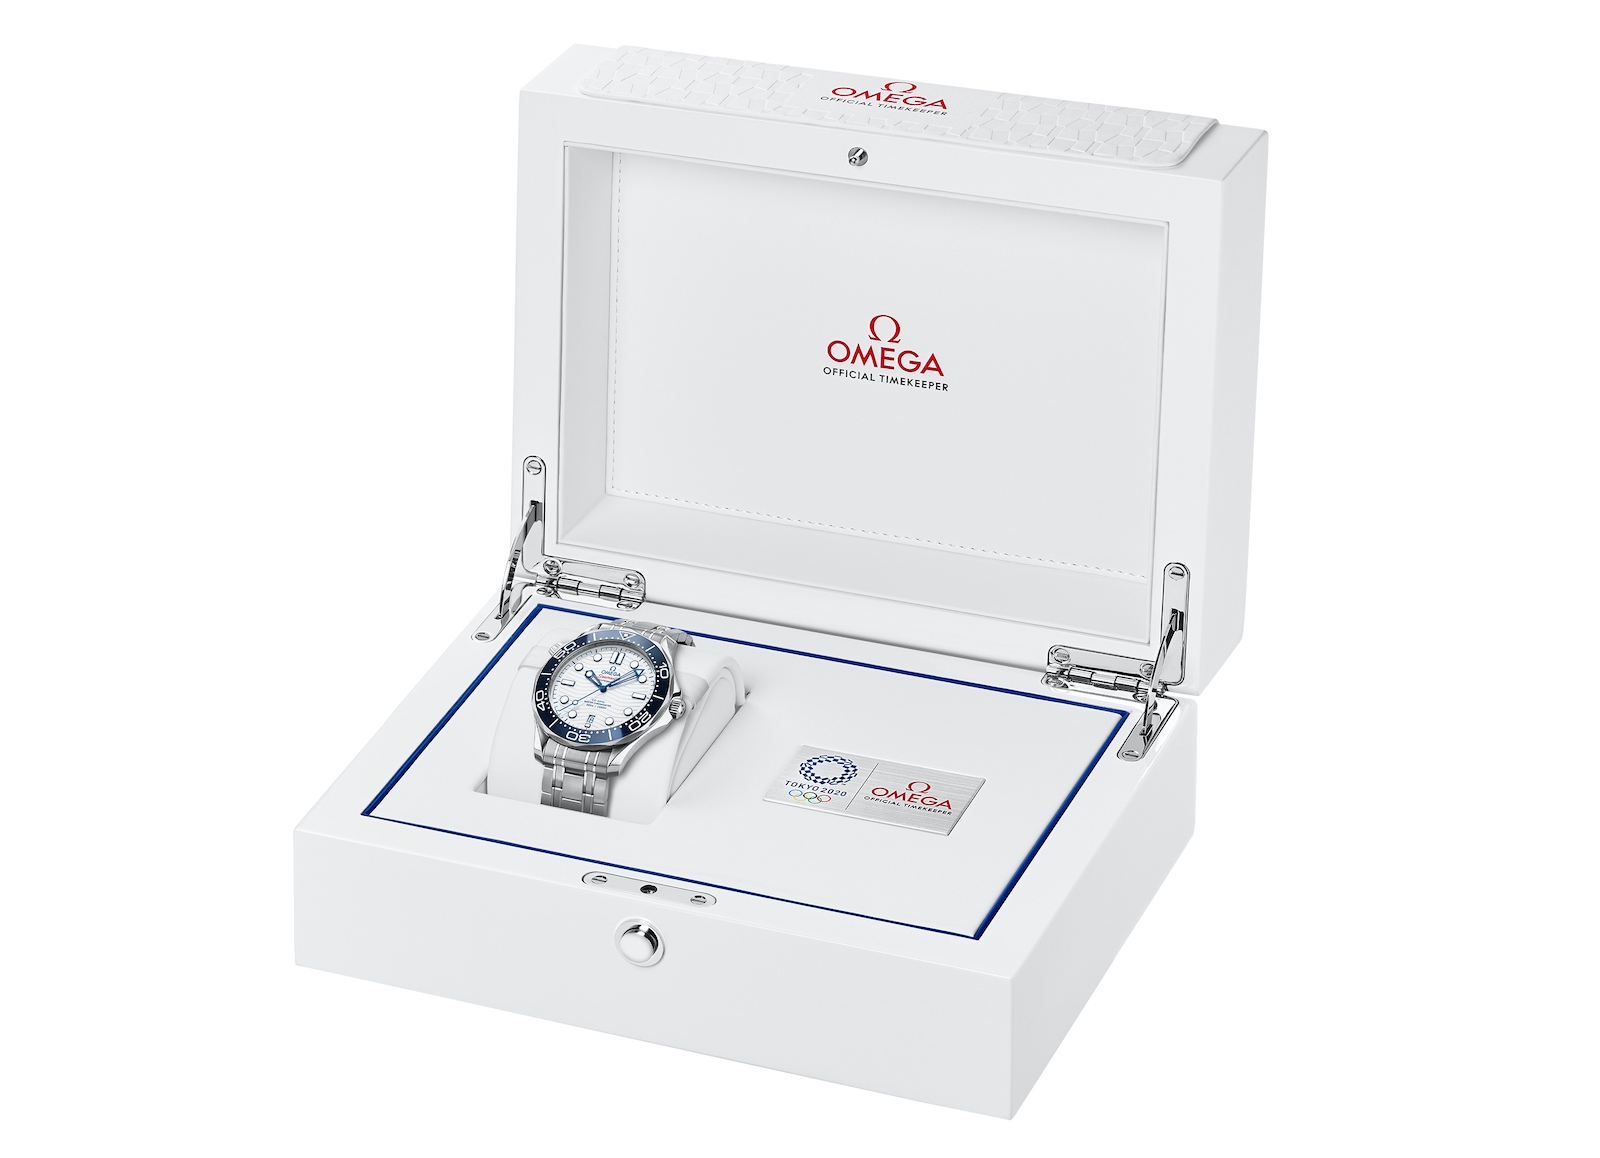 Omega Seamaster Diver 300M Tokyo 2020 - box